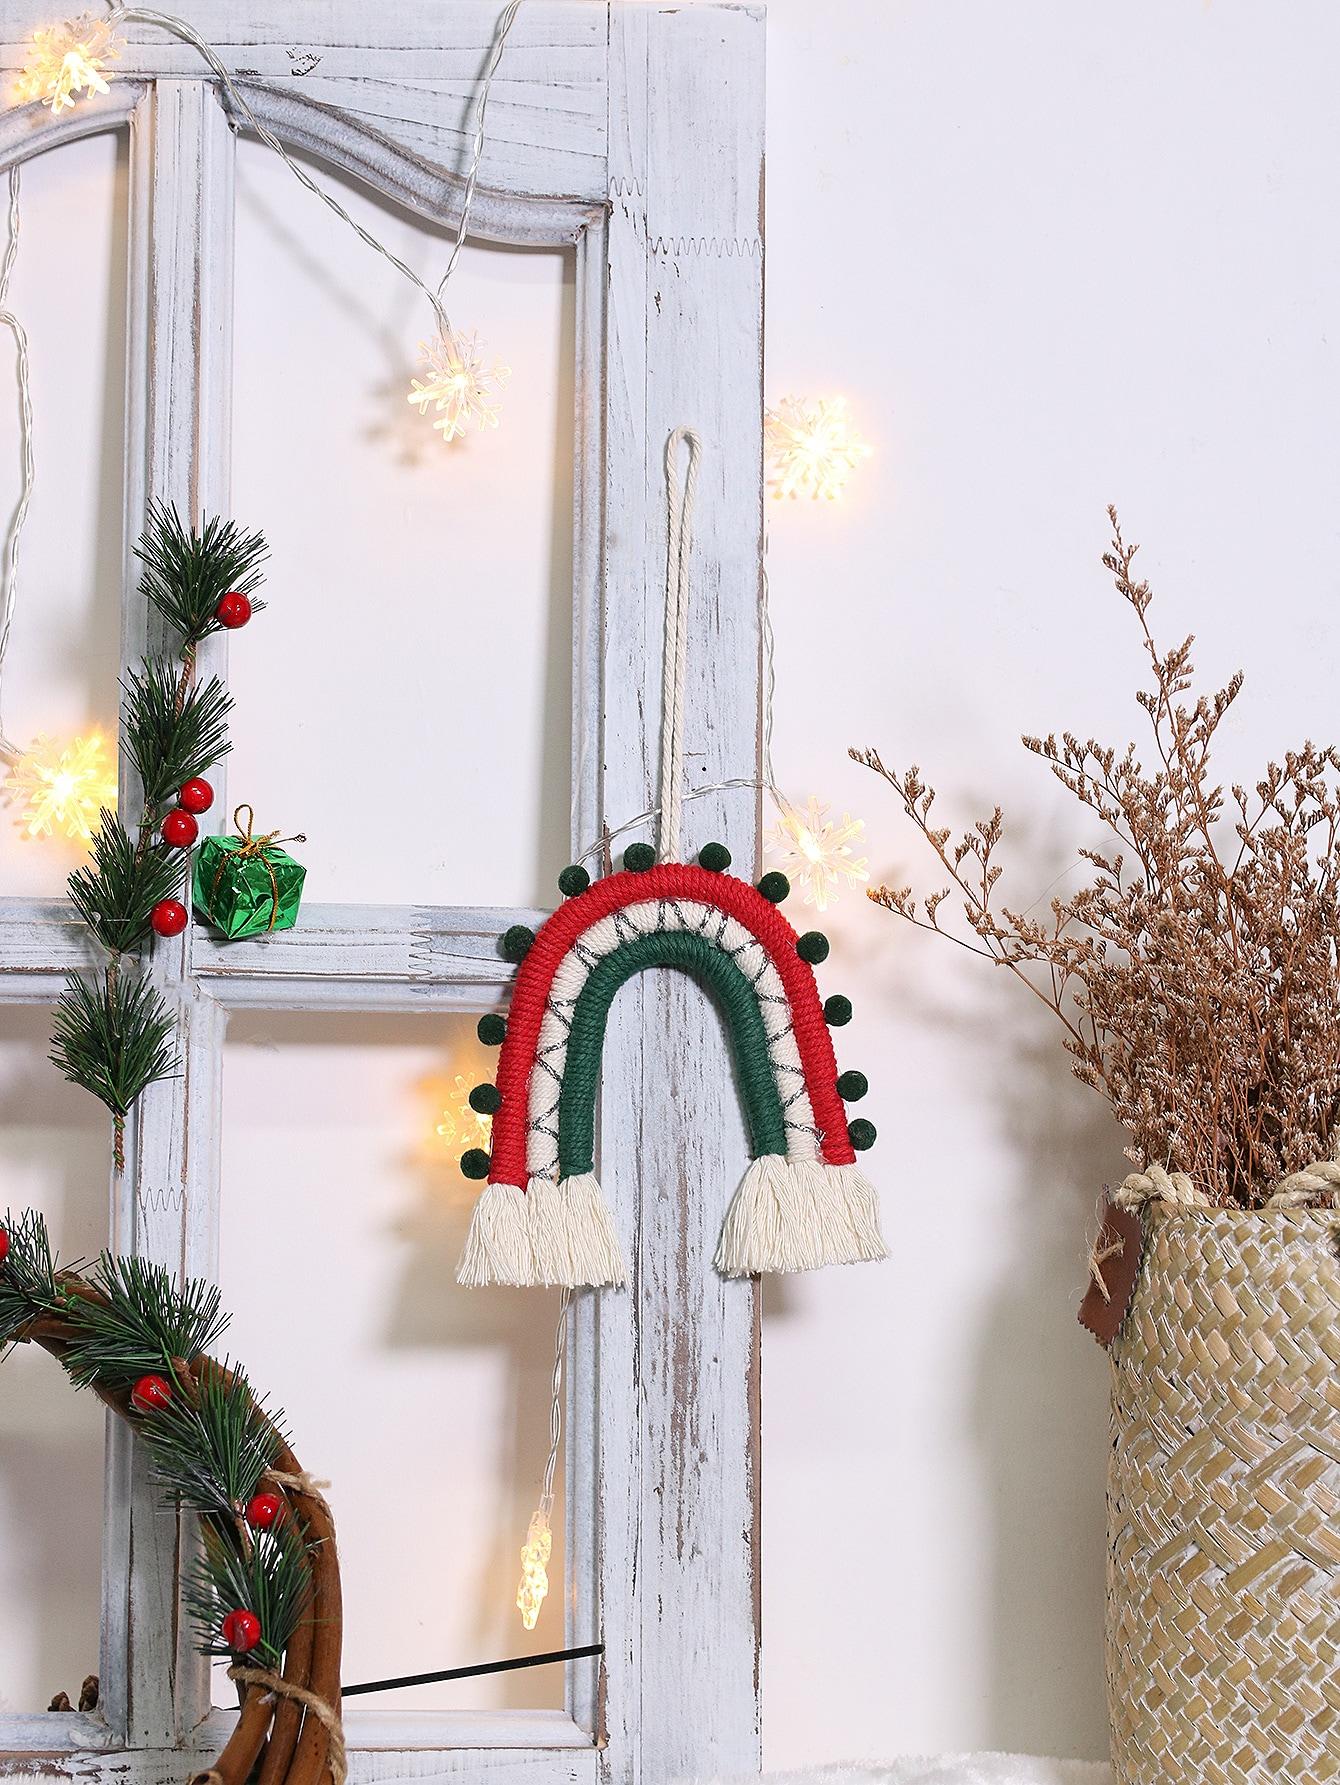 Christmas Braided Pom Pom Wall Hanging Romwe Usa